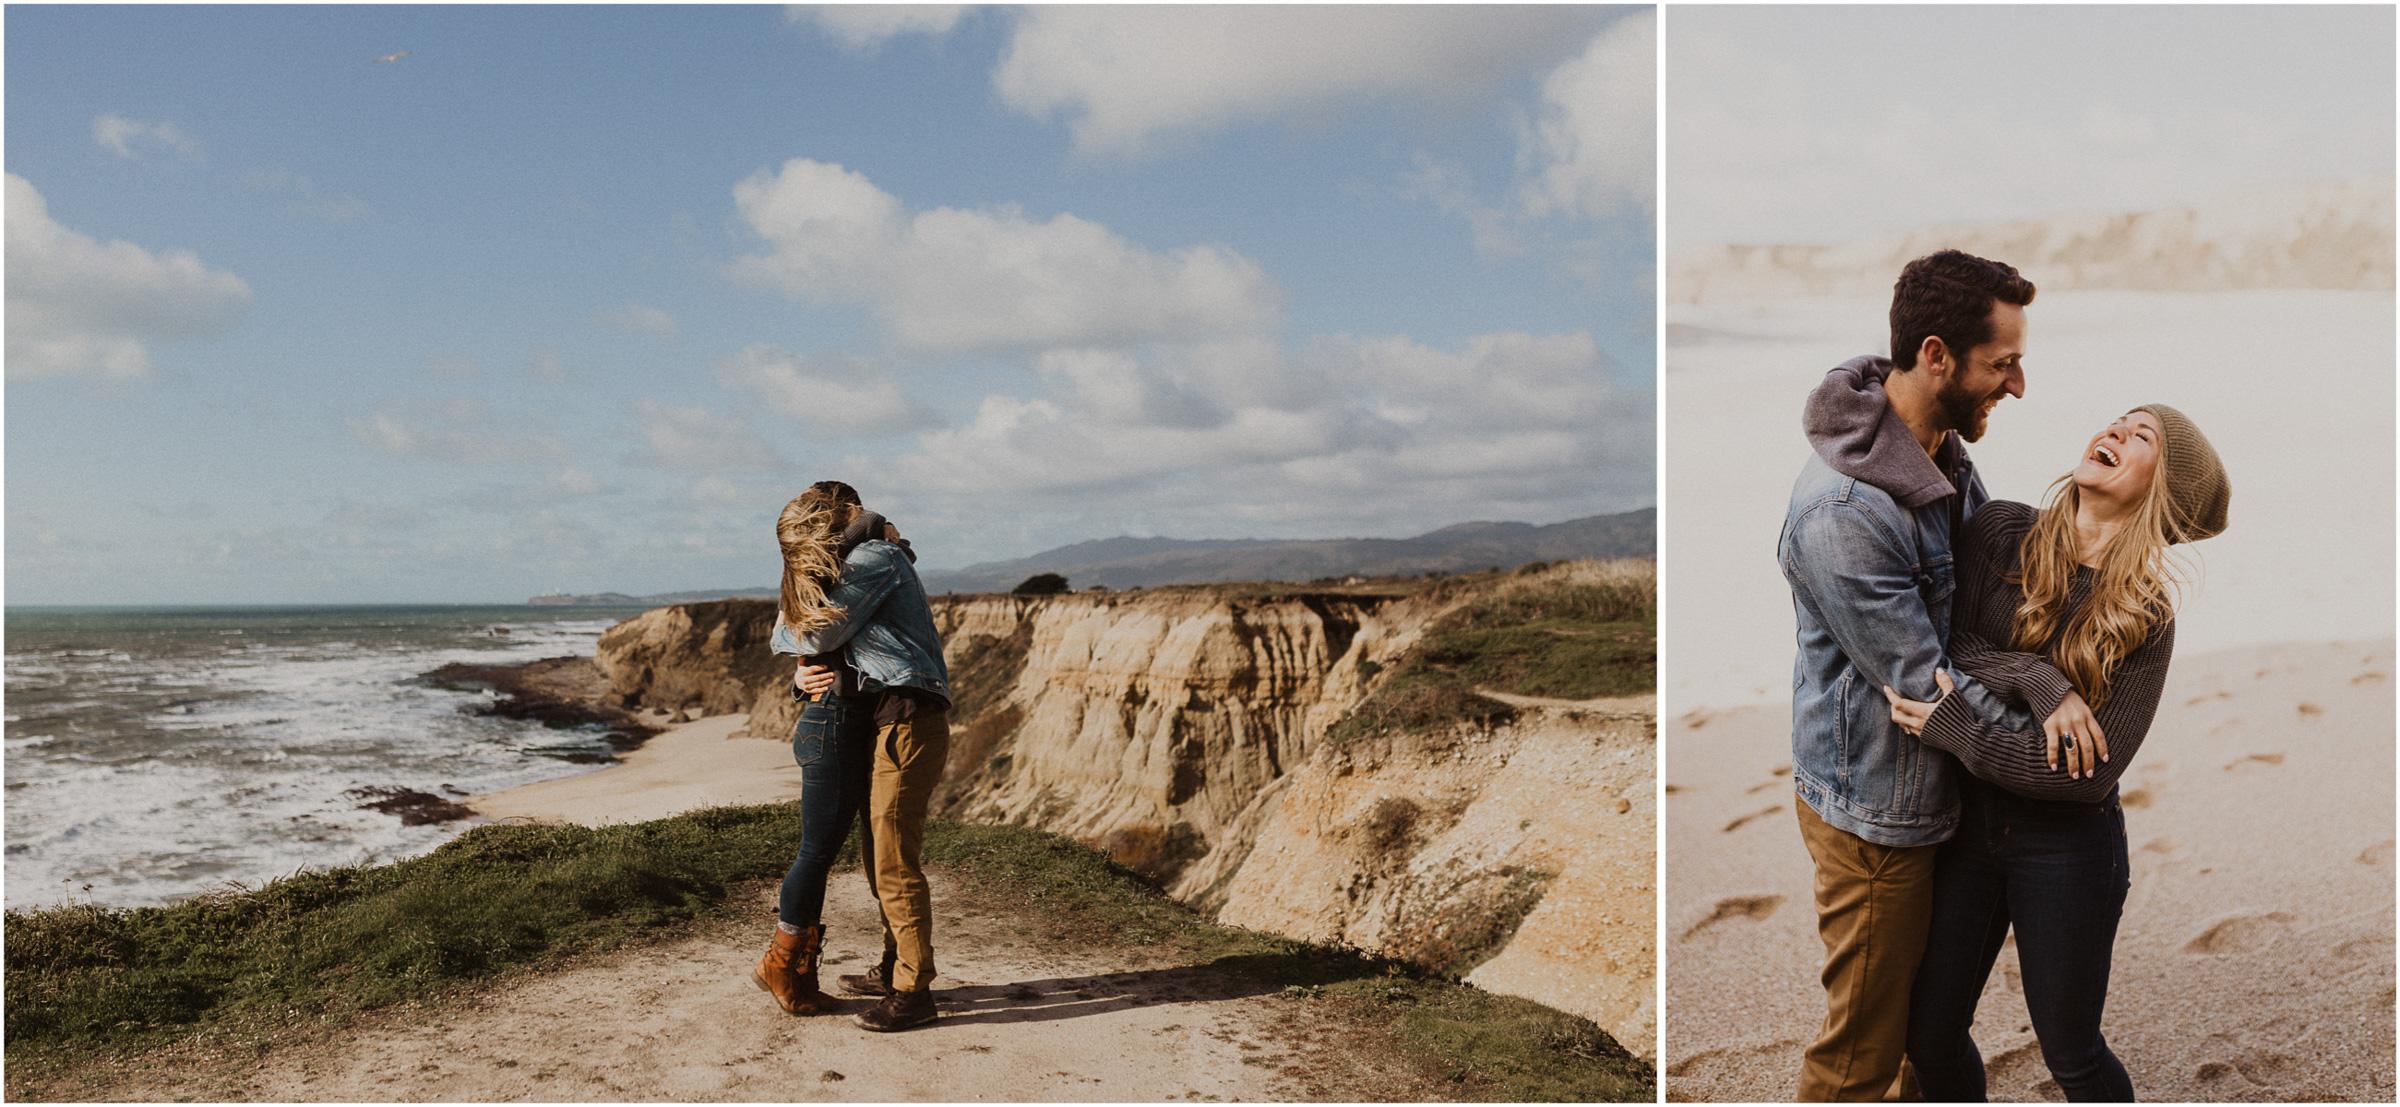 alyssa barletter photography santa cruz beach engagement california photographer-6.jpg